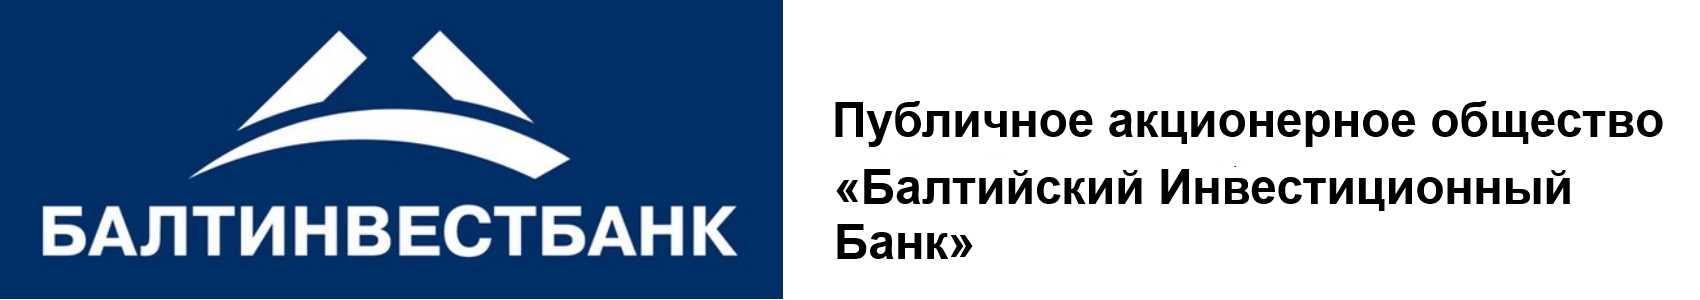 ПАО «Балтийский Инвестиционный Банк»